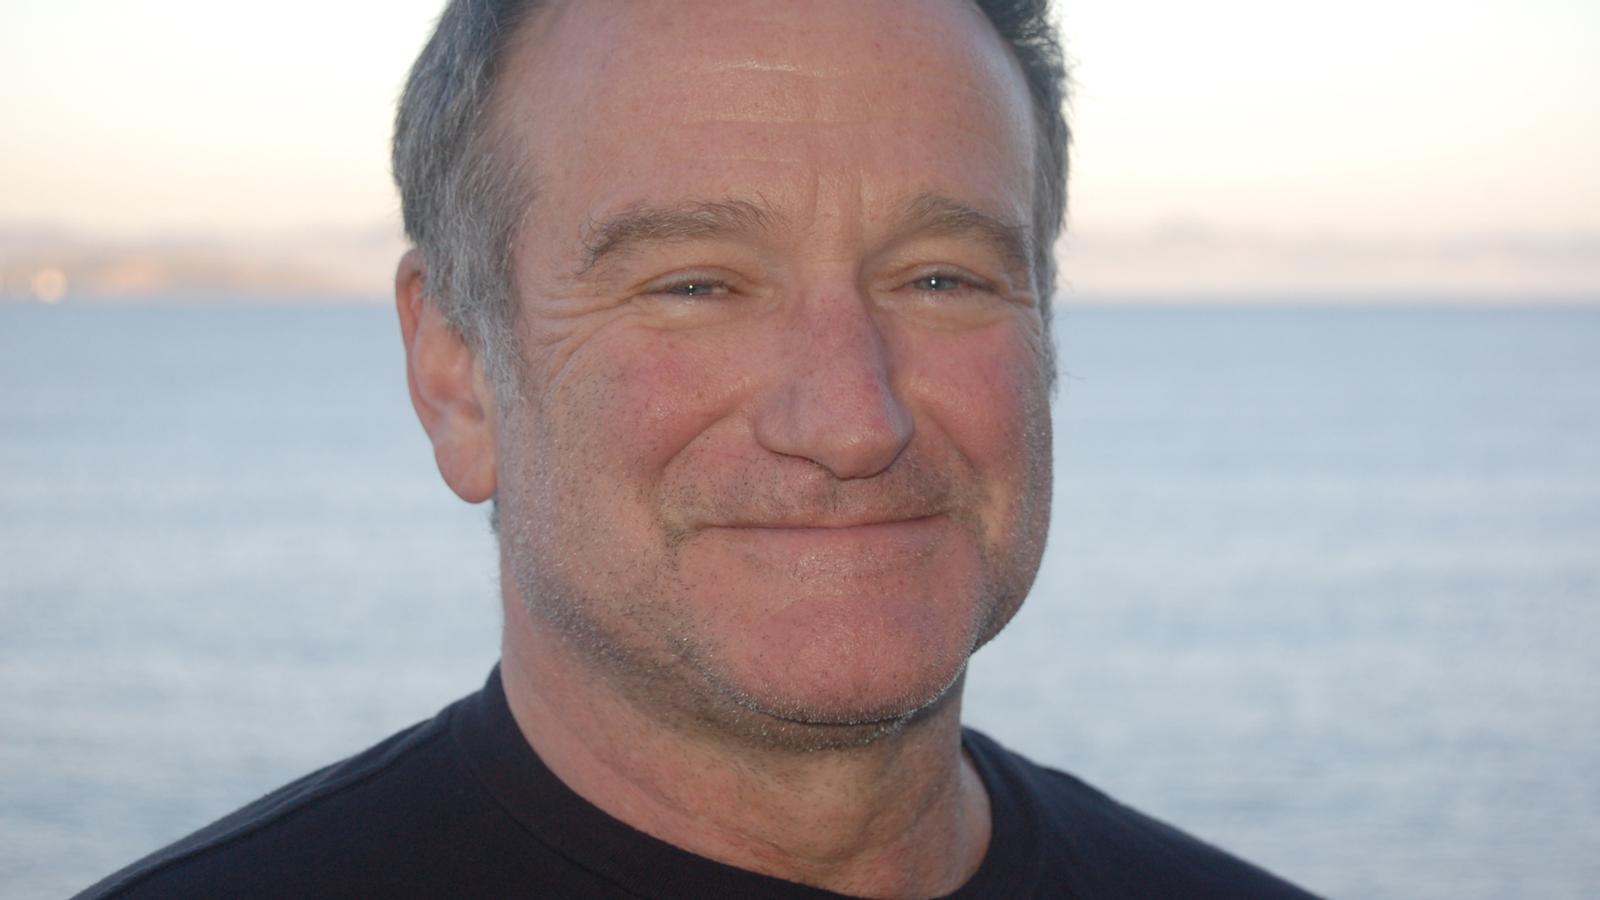 Robin Williams protagonitza el documental 'El deseo de Robin'